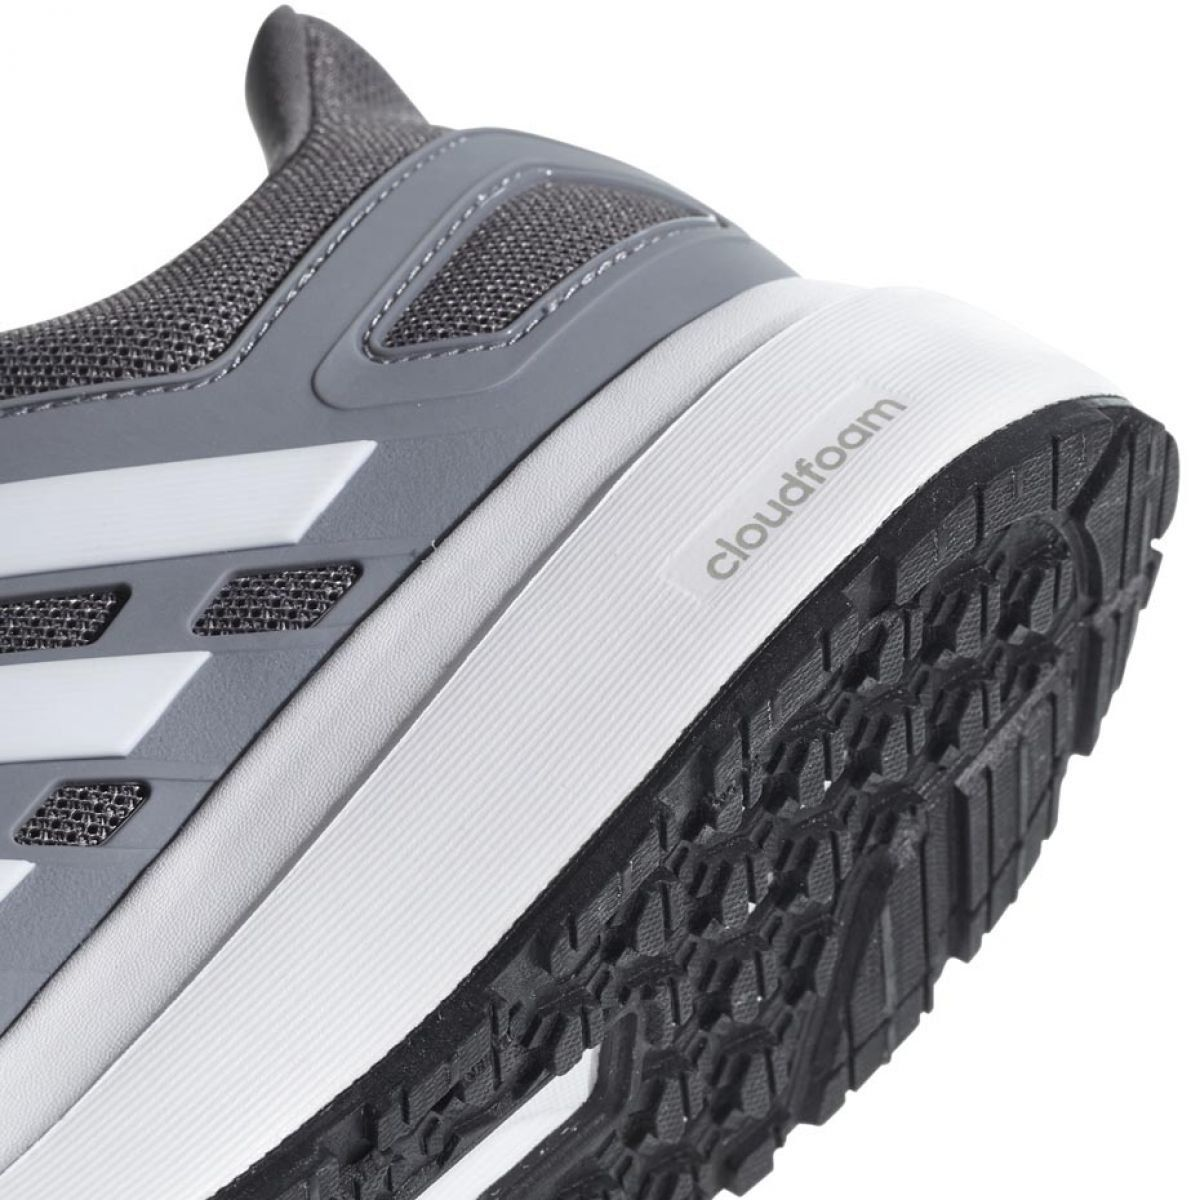 Buty Biegowe Adidas Energy Cloud 2 M B44751 Szare Adidas Running Shoes Adidas Shoes Running Shoes